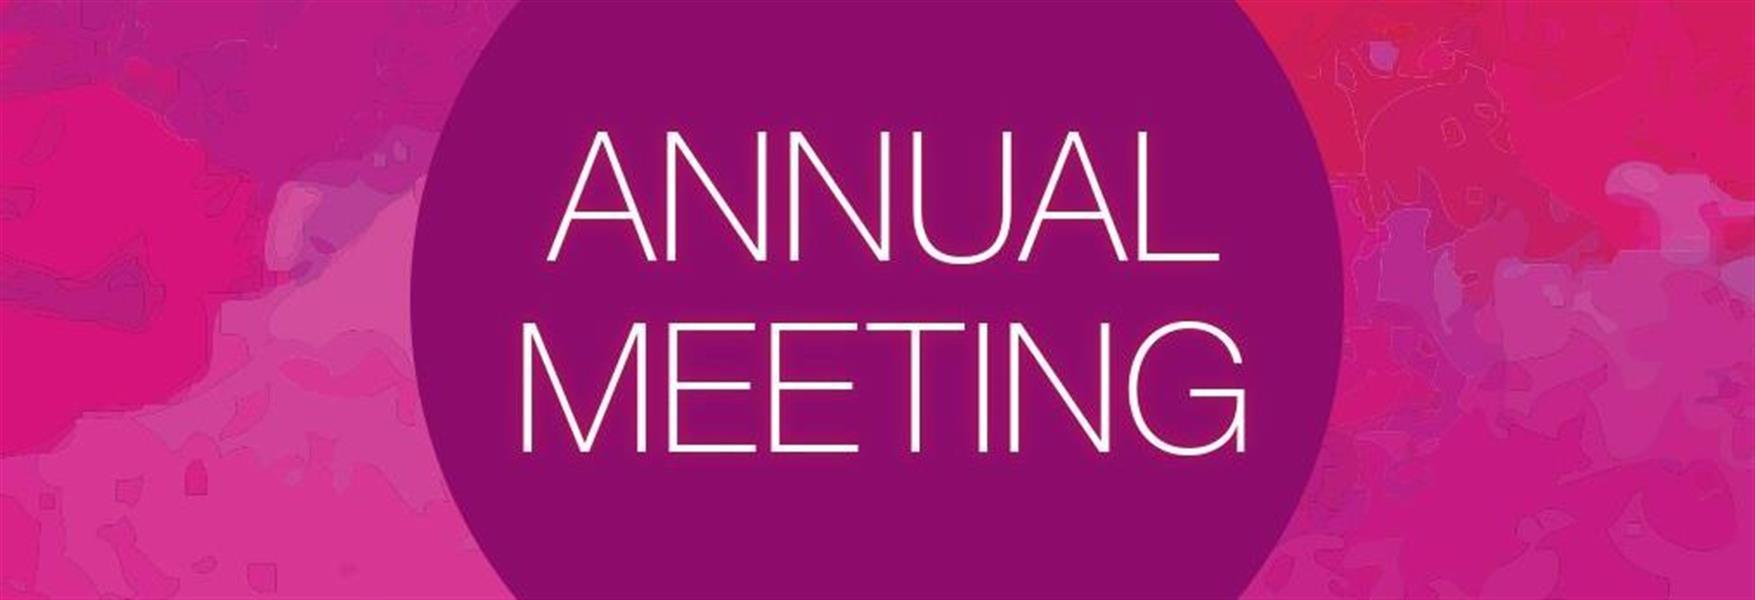 7fe61a37-1a7f-454b-b1ea-4a3e6a7d0154_Annual_Meeting-1013x500.jpg